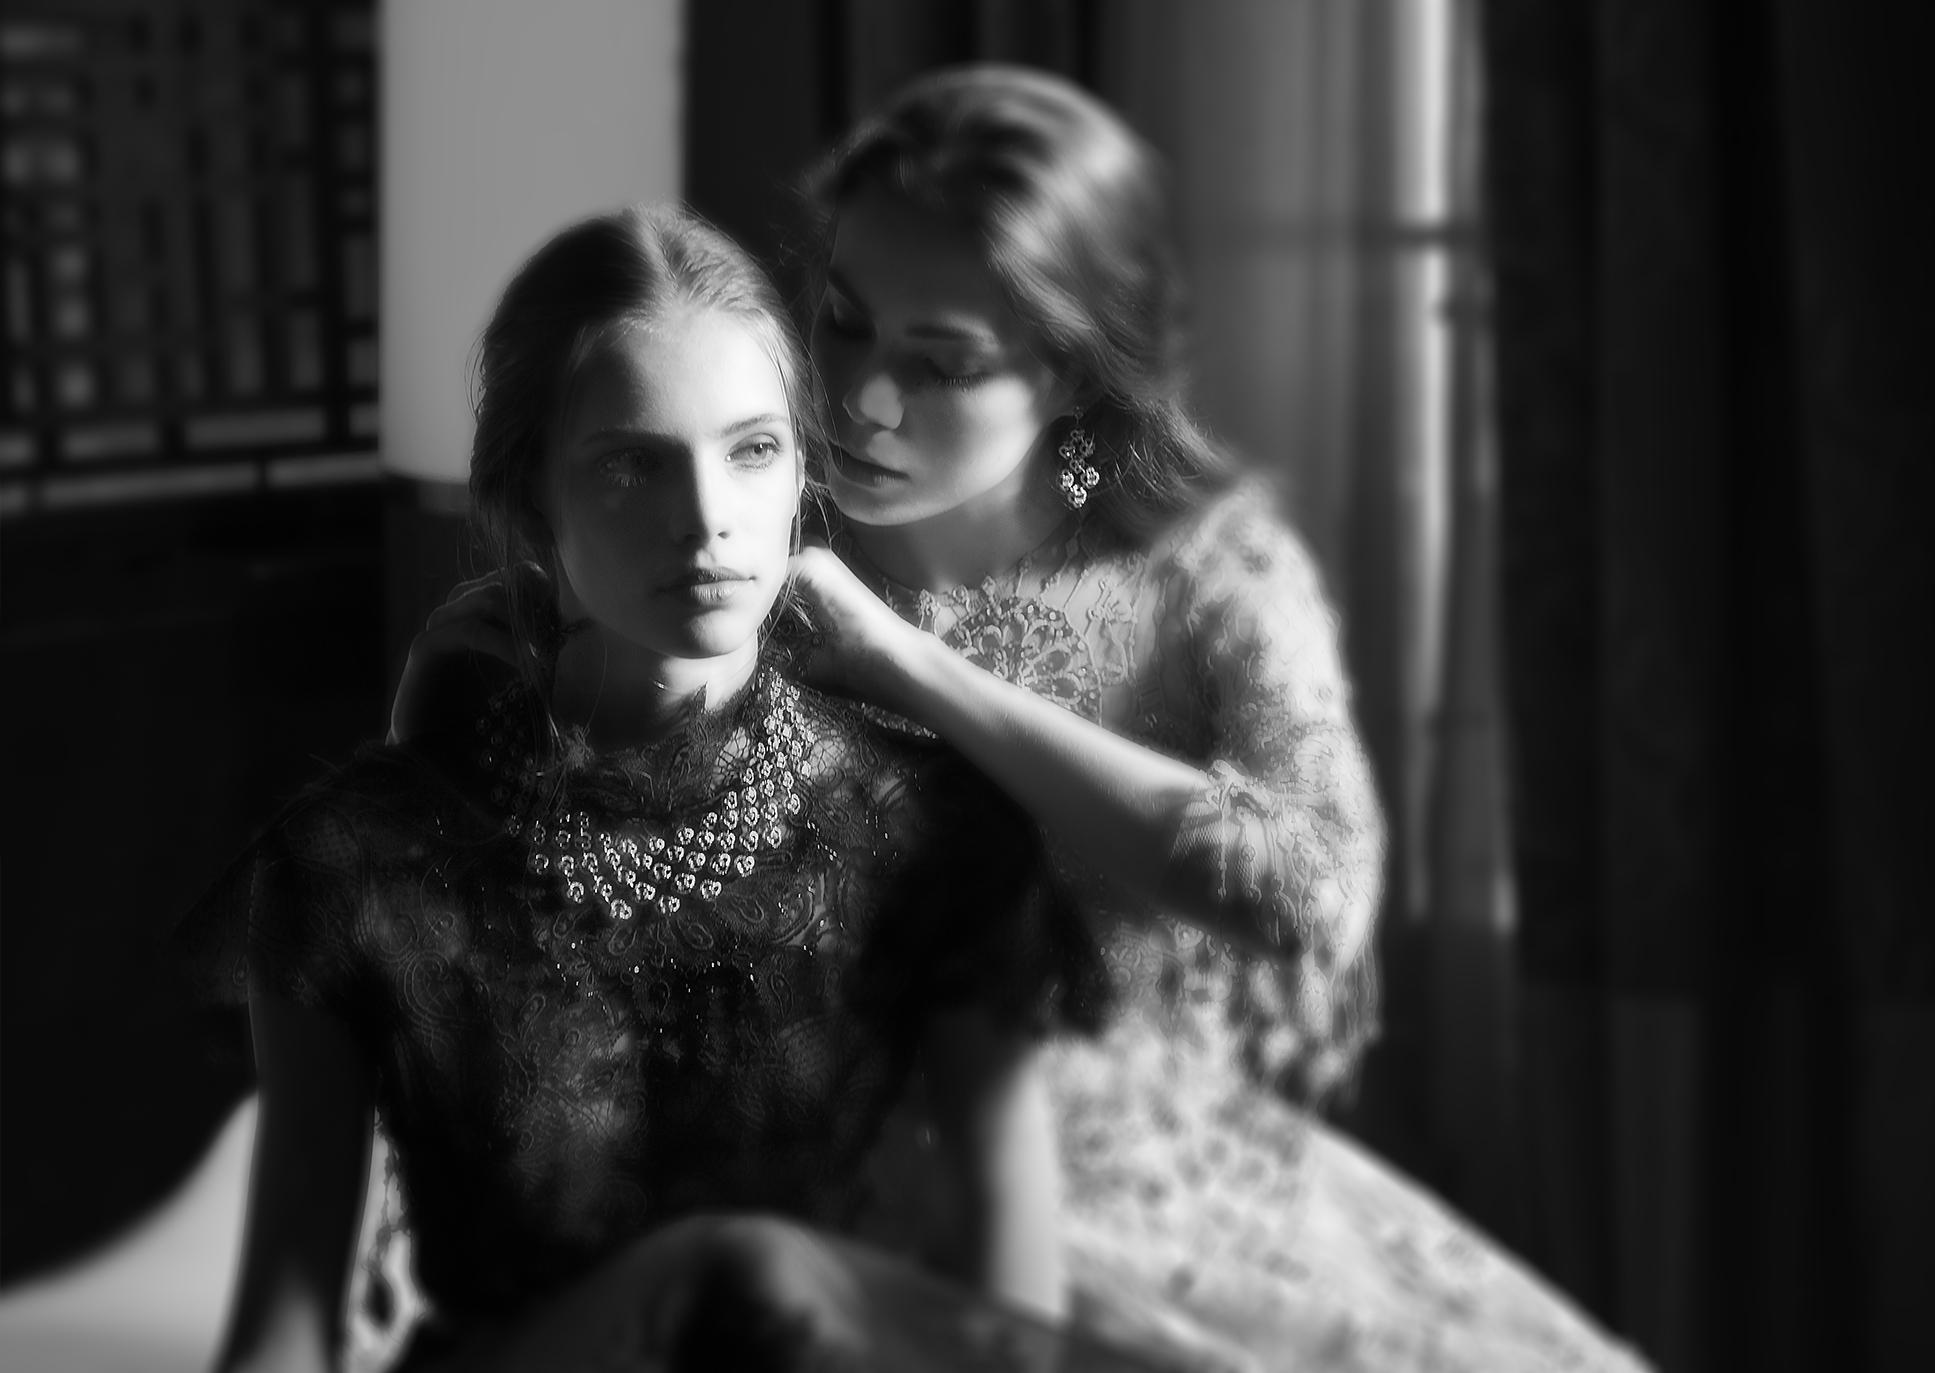 Robe en dentelle noir : DANY ATRACHE Collier et Boucles d'oreilles haute joaillerie Collection Sakura by NIRAV MODI